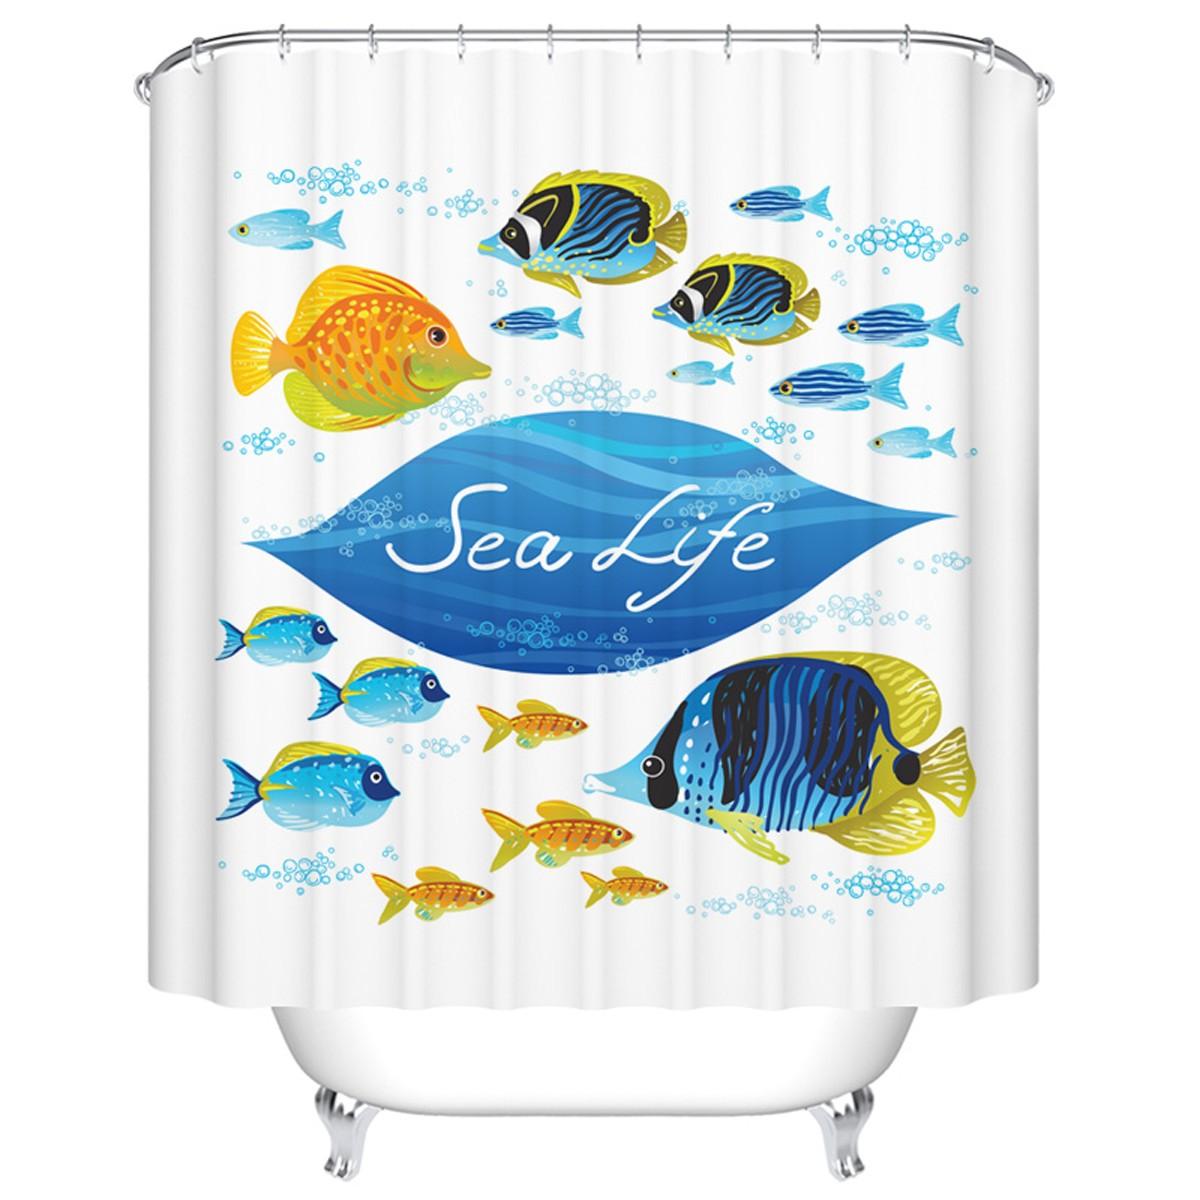 "Fashionable Bathroom Waterproof Shower Curtain, 70"" W x 72"" H (DK-YT028)"